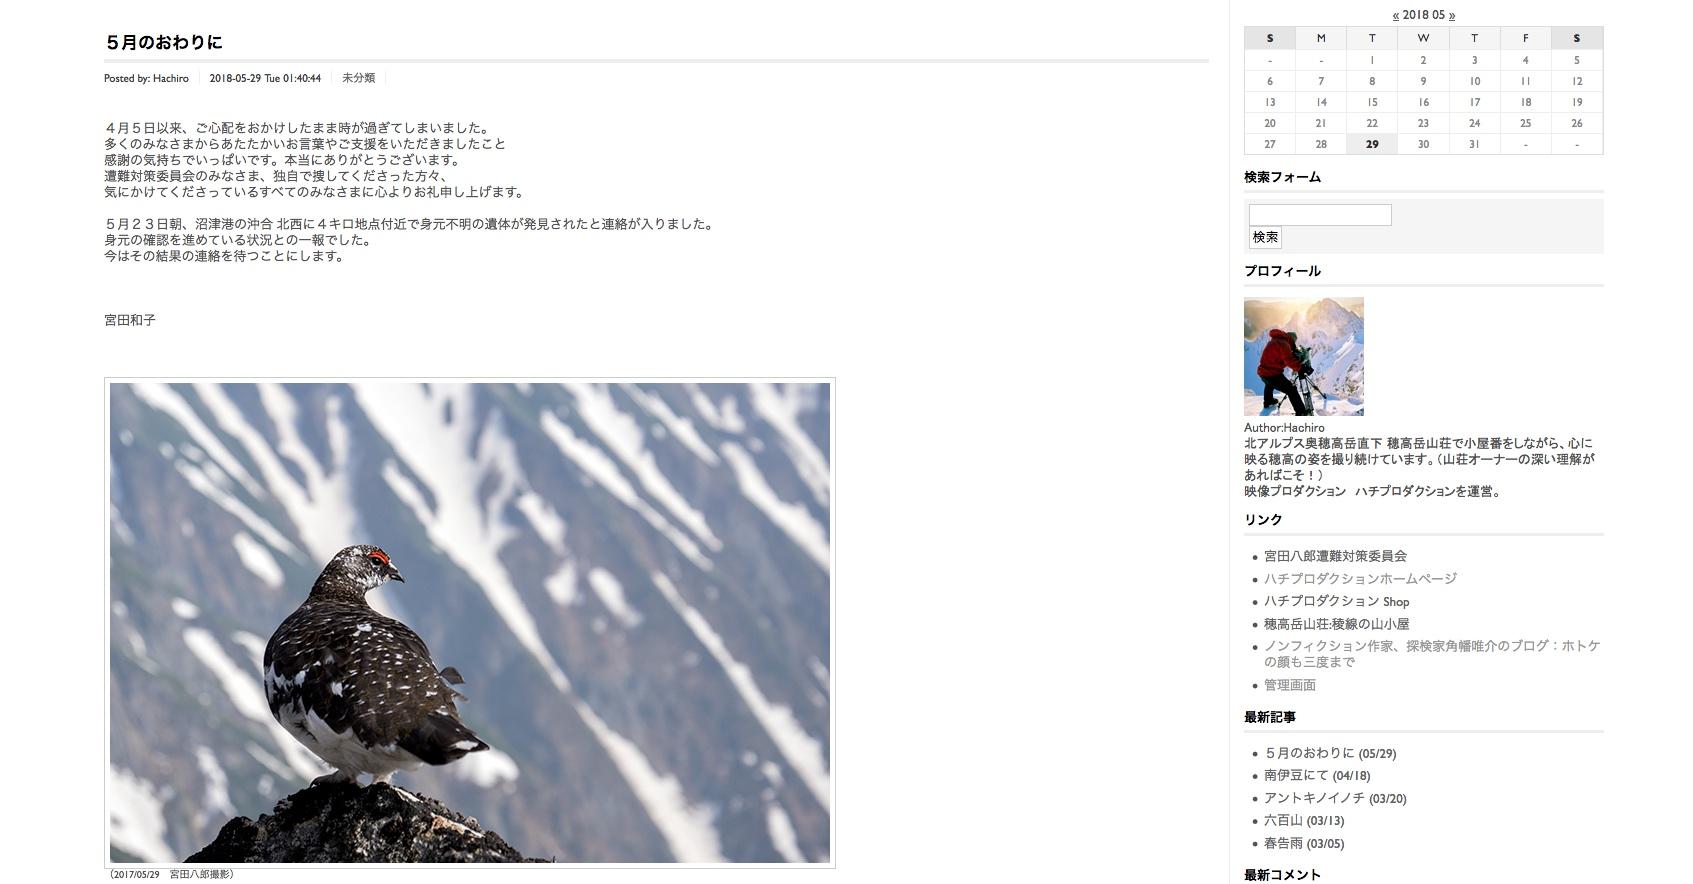 https://cdn-ak.f.st-hatena.com/images/fotolife/s/shioshiohida/20180529/20180529022047_original.jpg?1527528066